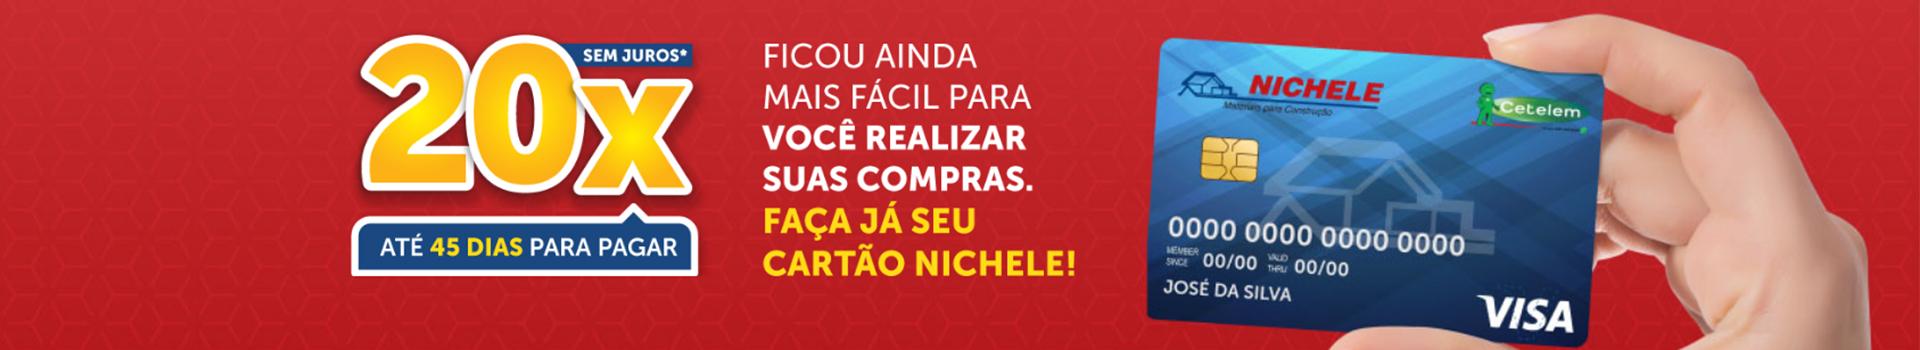 Nichele-20x